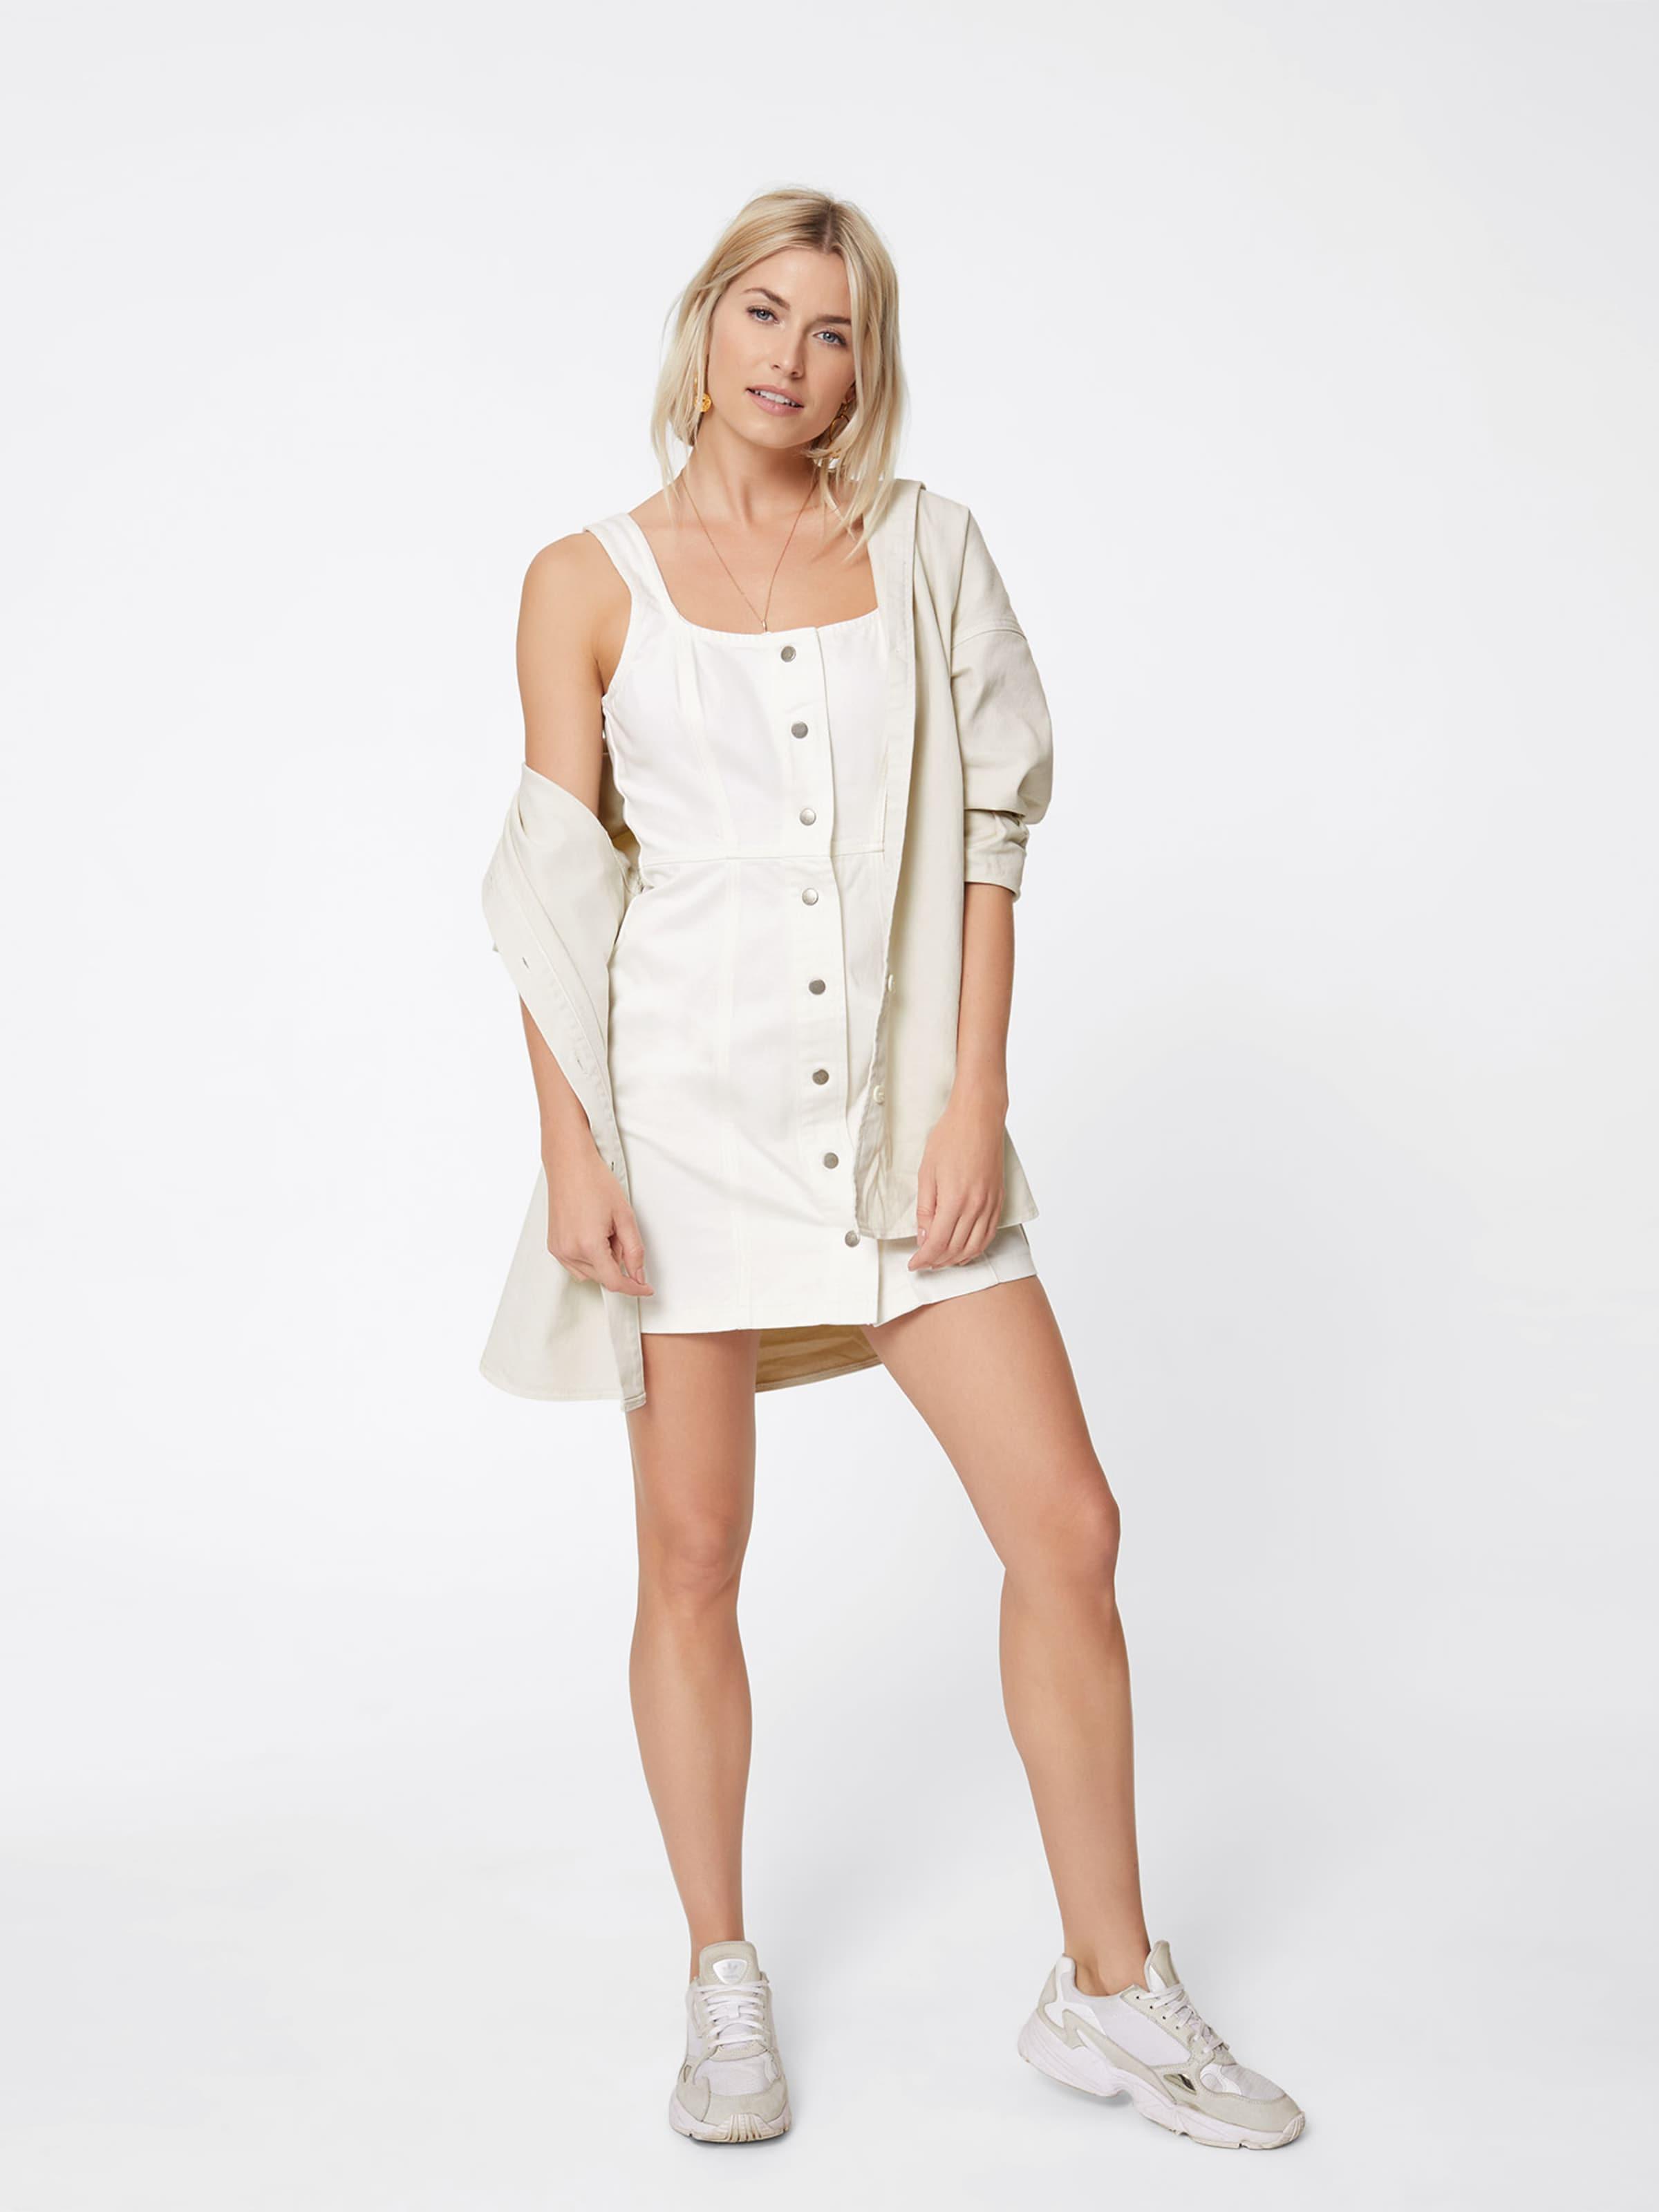 Kleid In 'hanna' Leger By Lena Offwhite Gercke uFlK3TcJ1